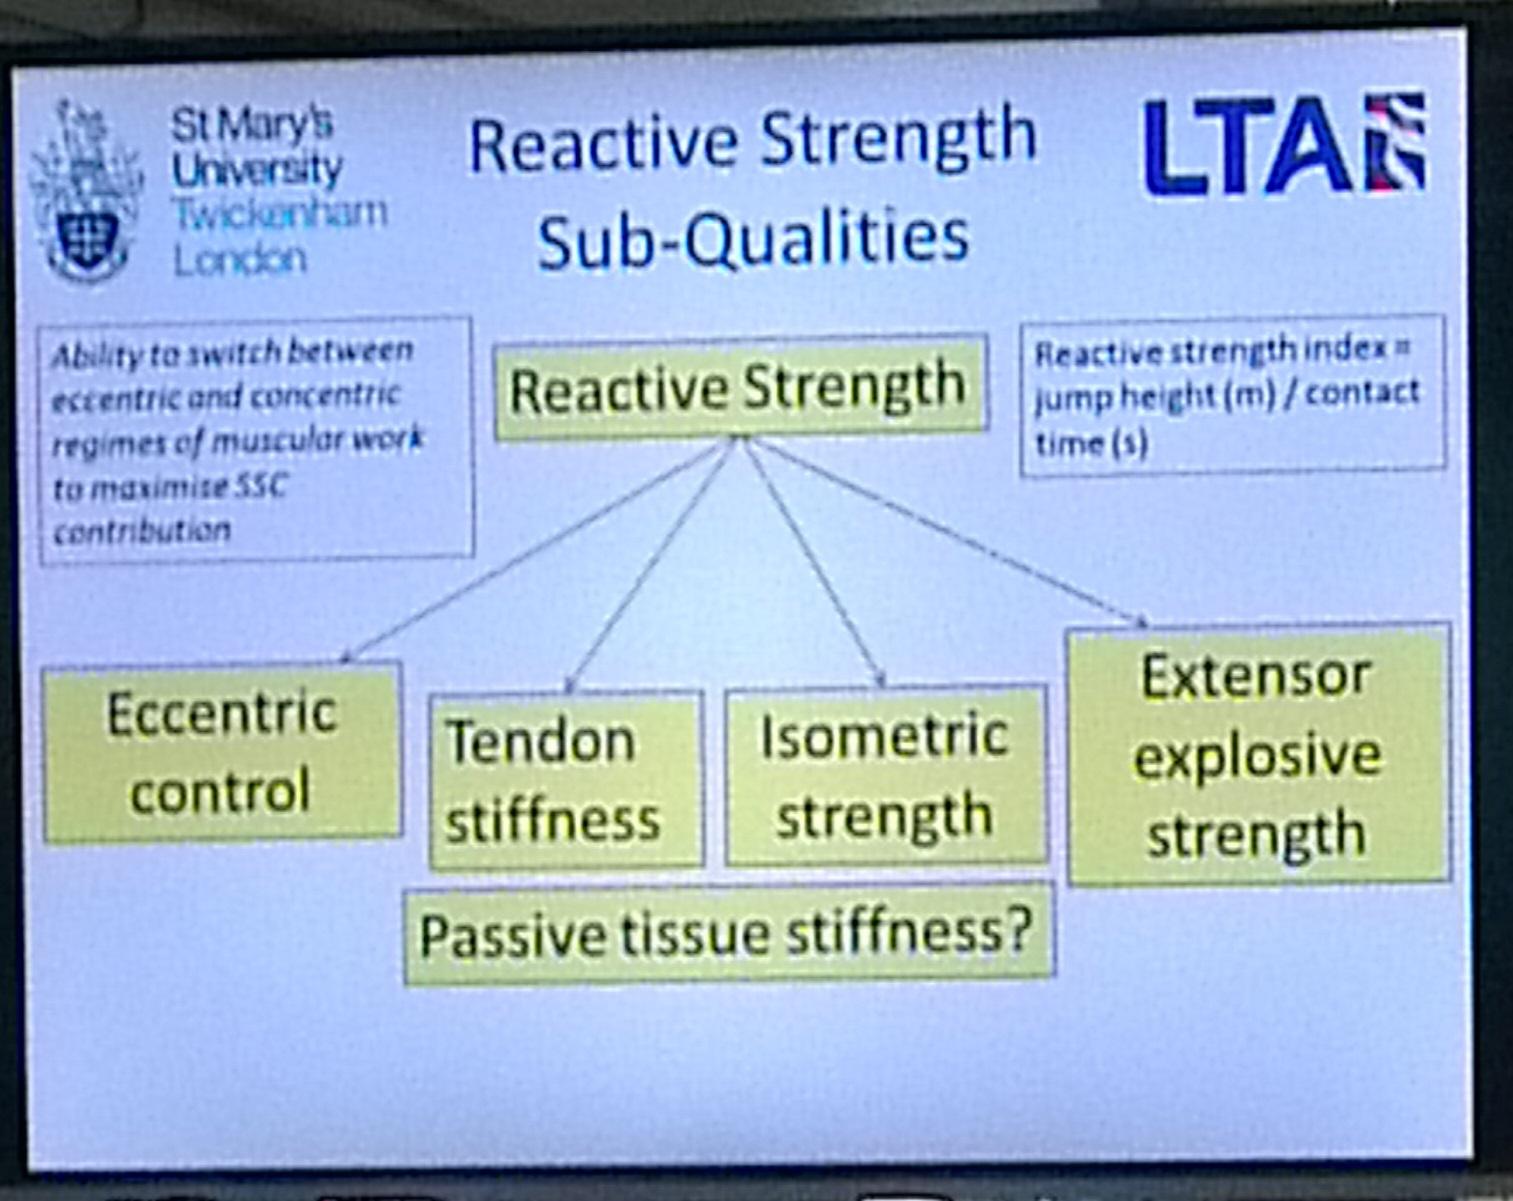 Reactive Strength